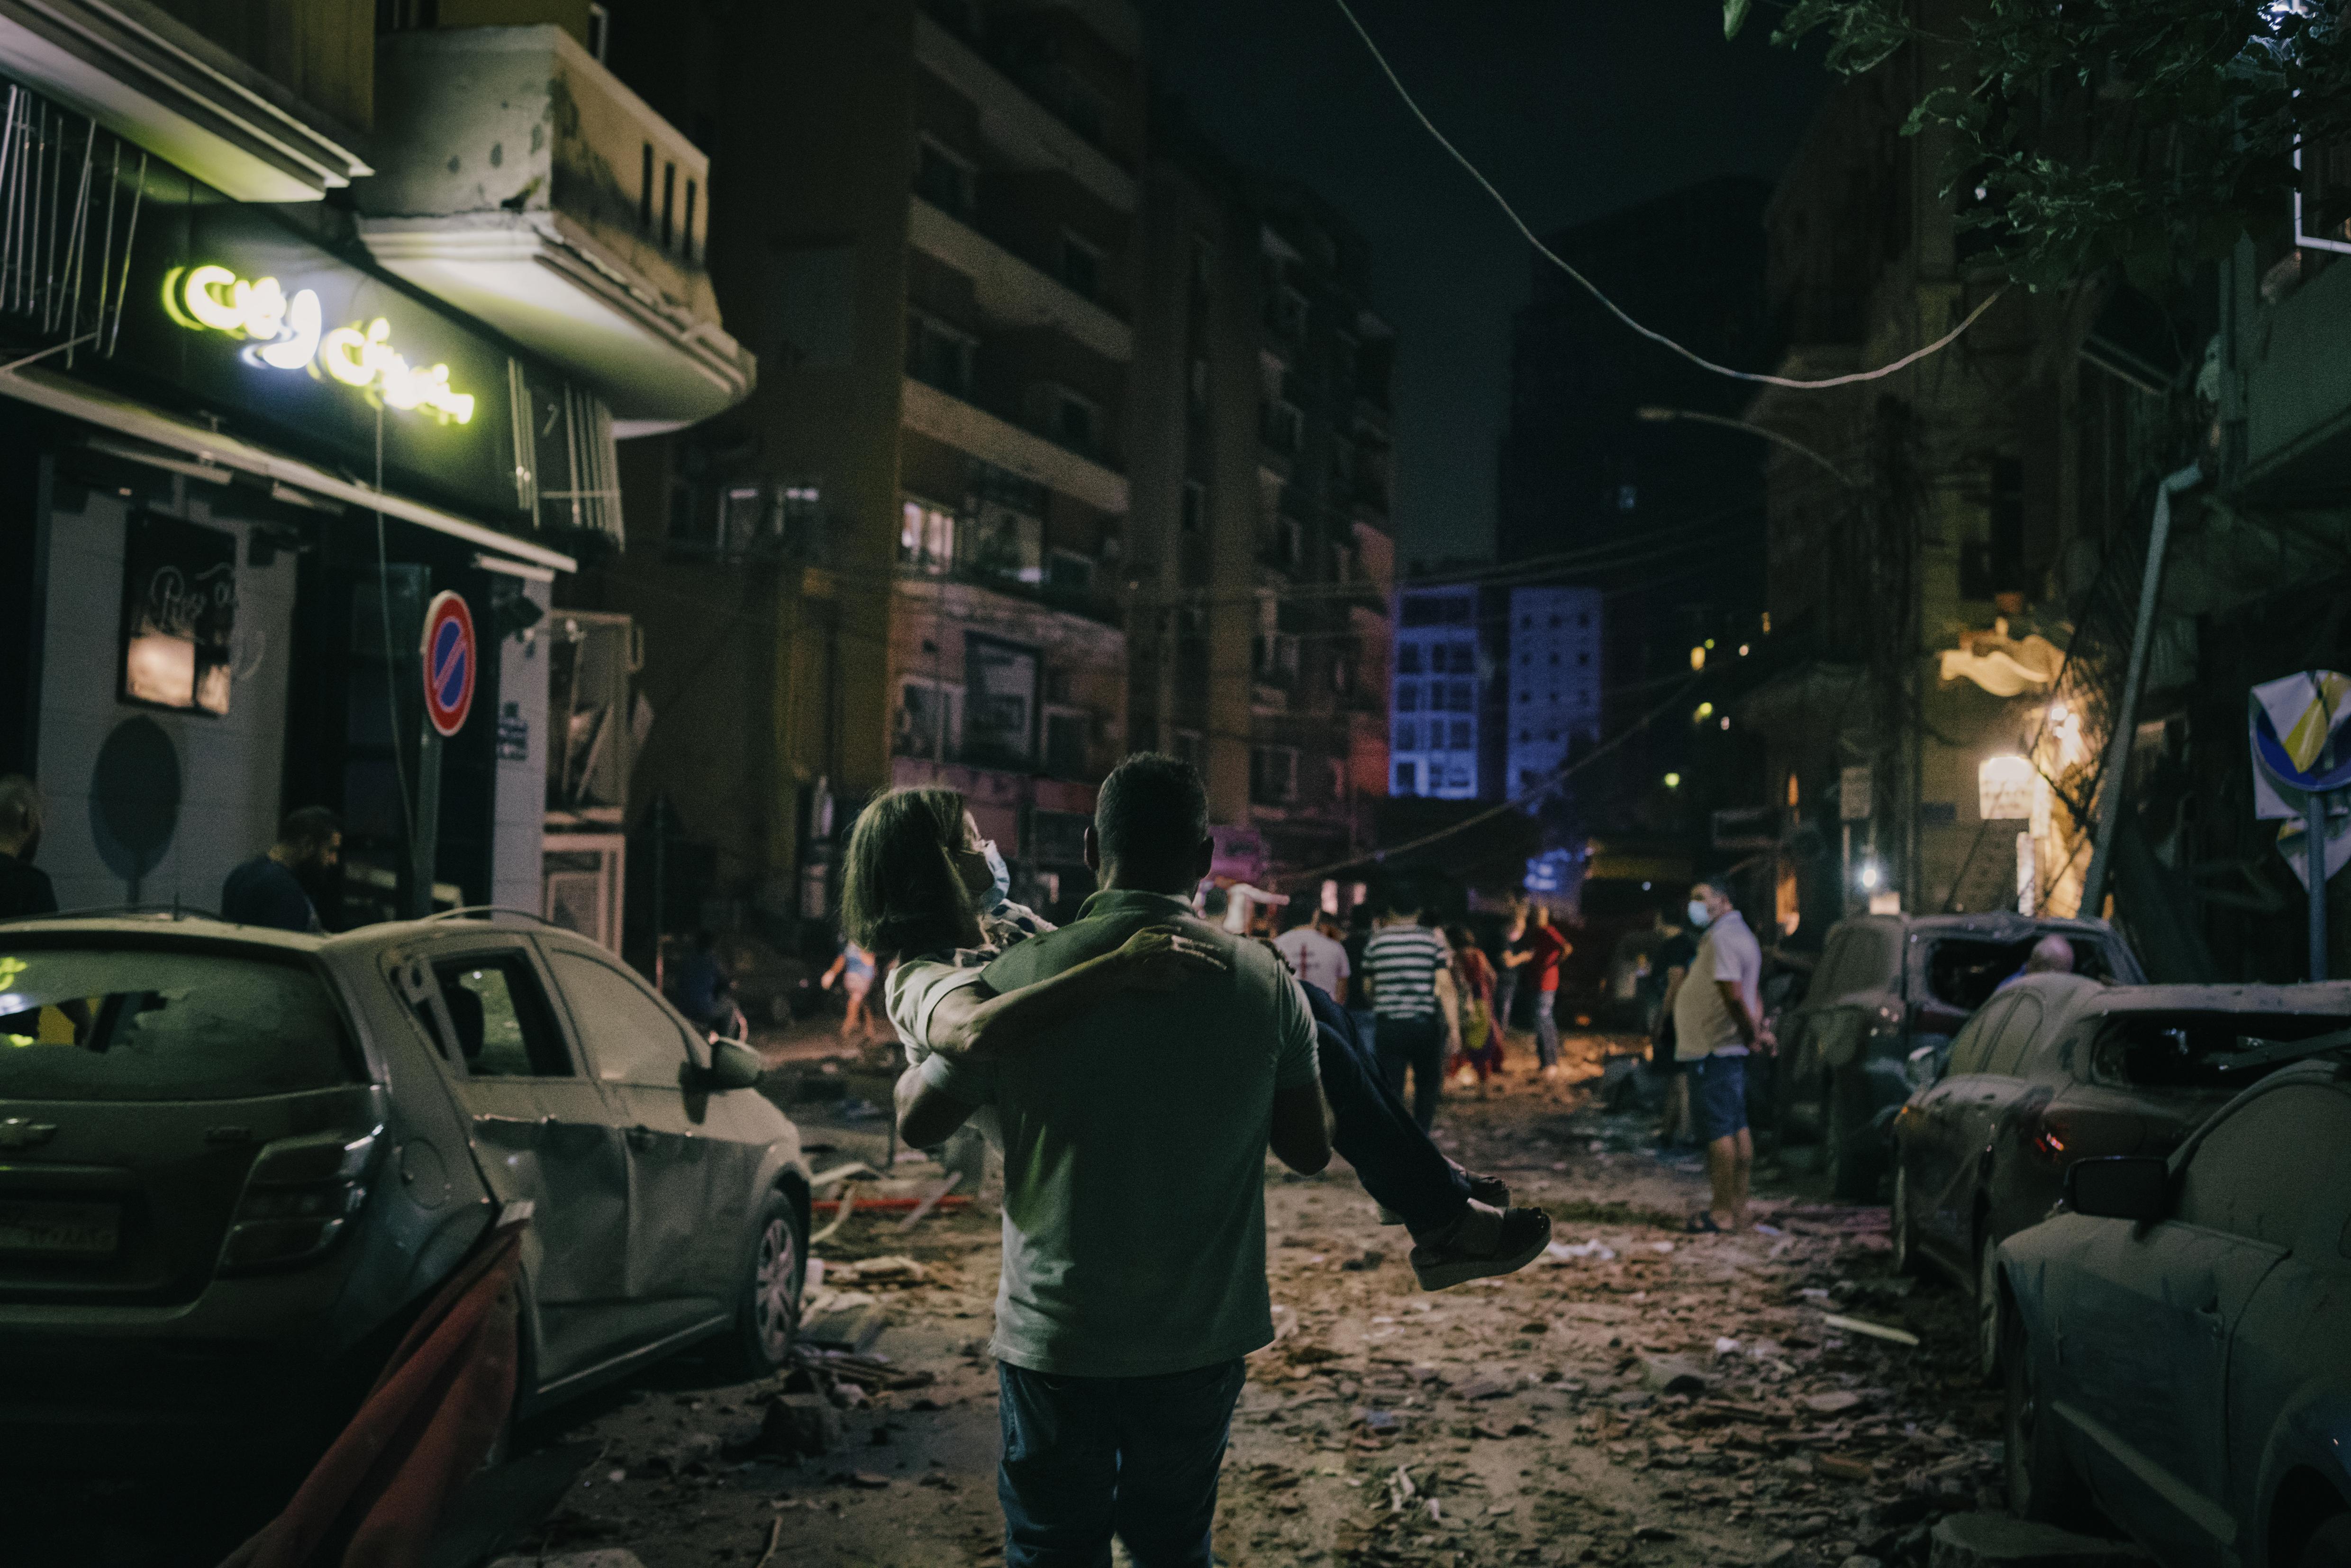 Port Explosion in Beirut, Lorenzo Tugnoli, Italy, Contrasto